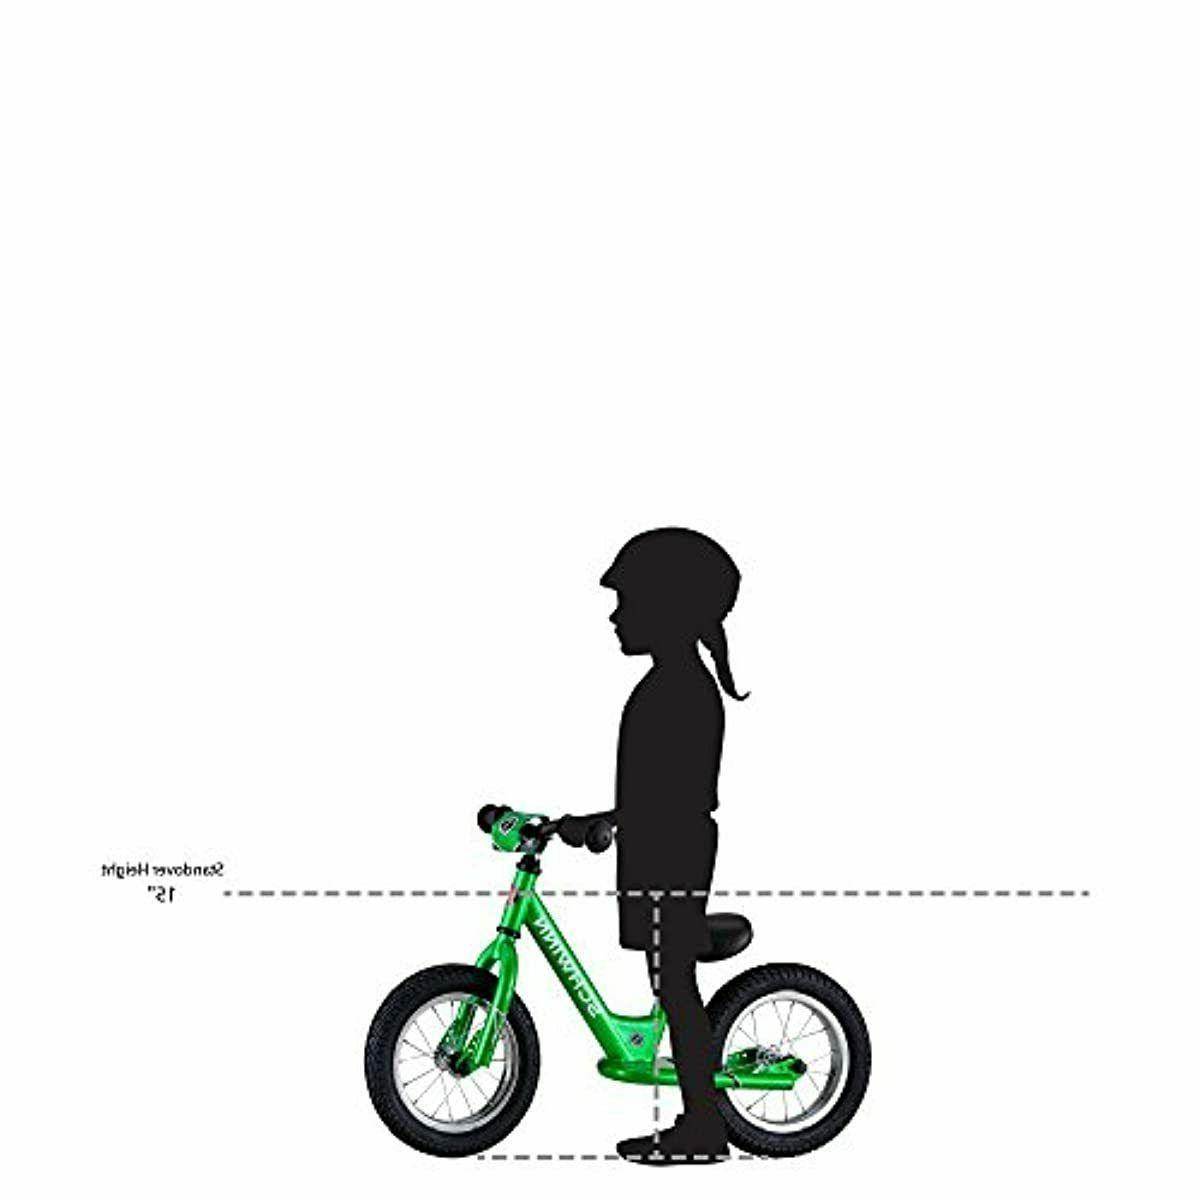 Skip Toddler 12-Inch Wheels, Beginner Rider Training NEW